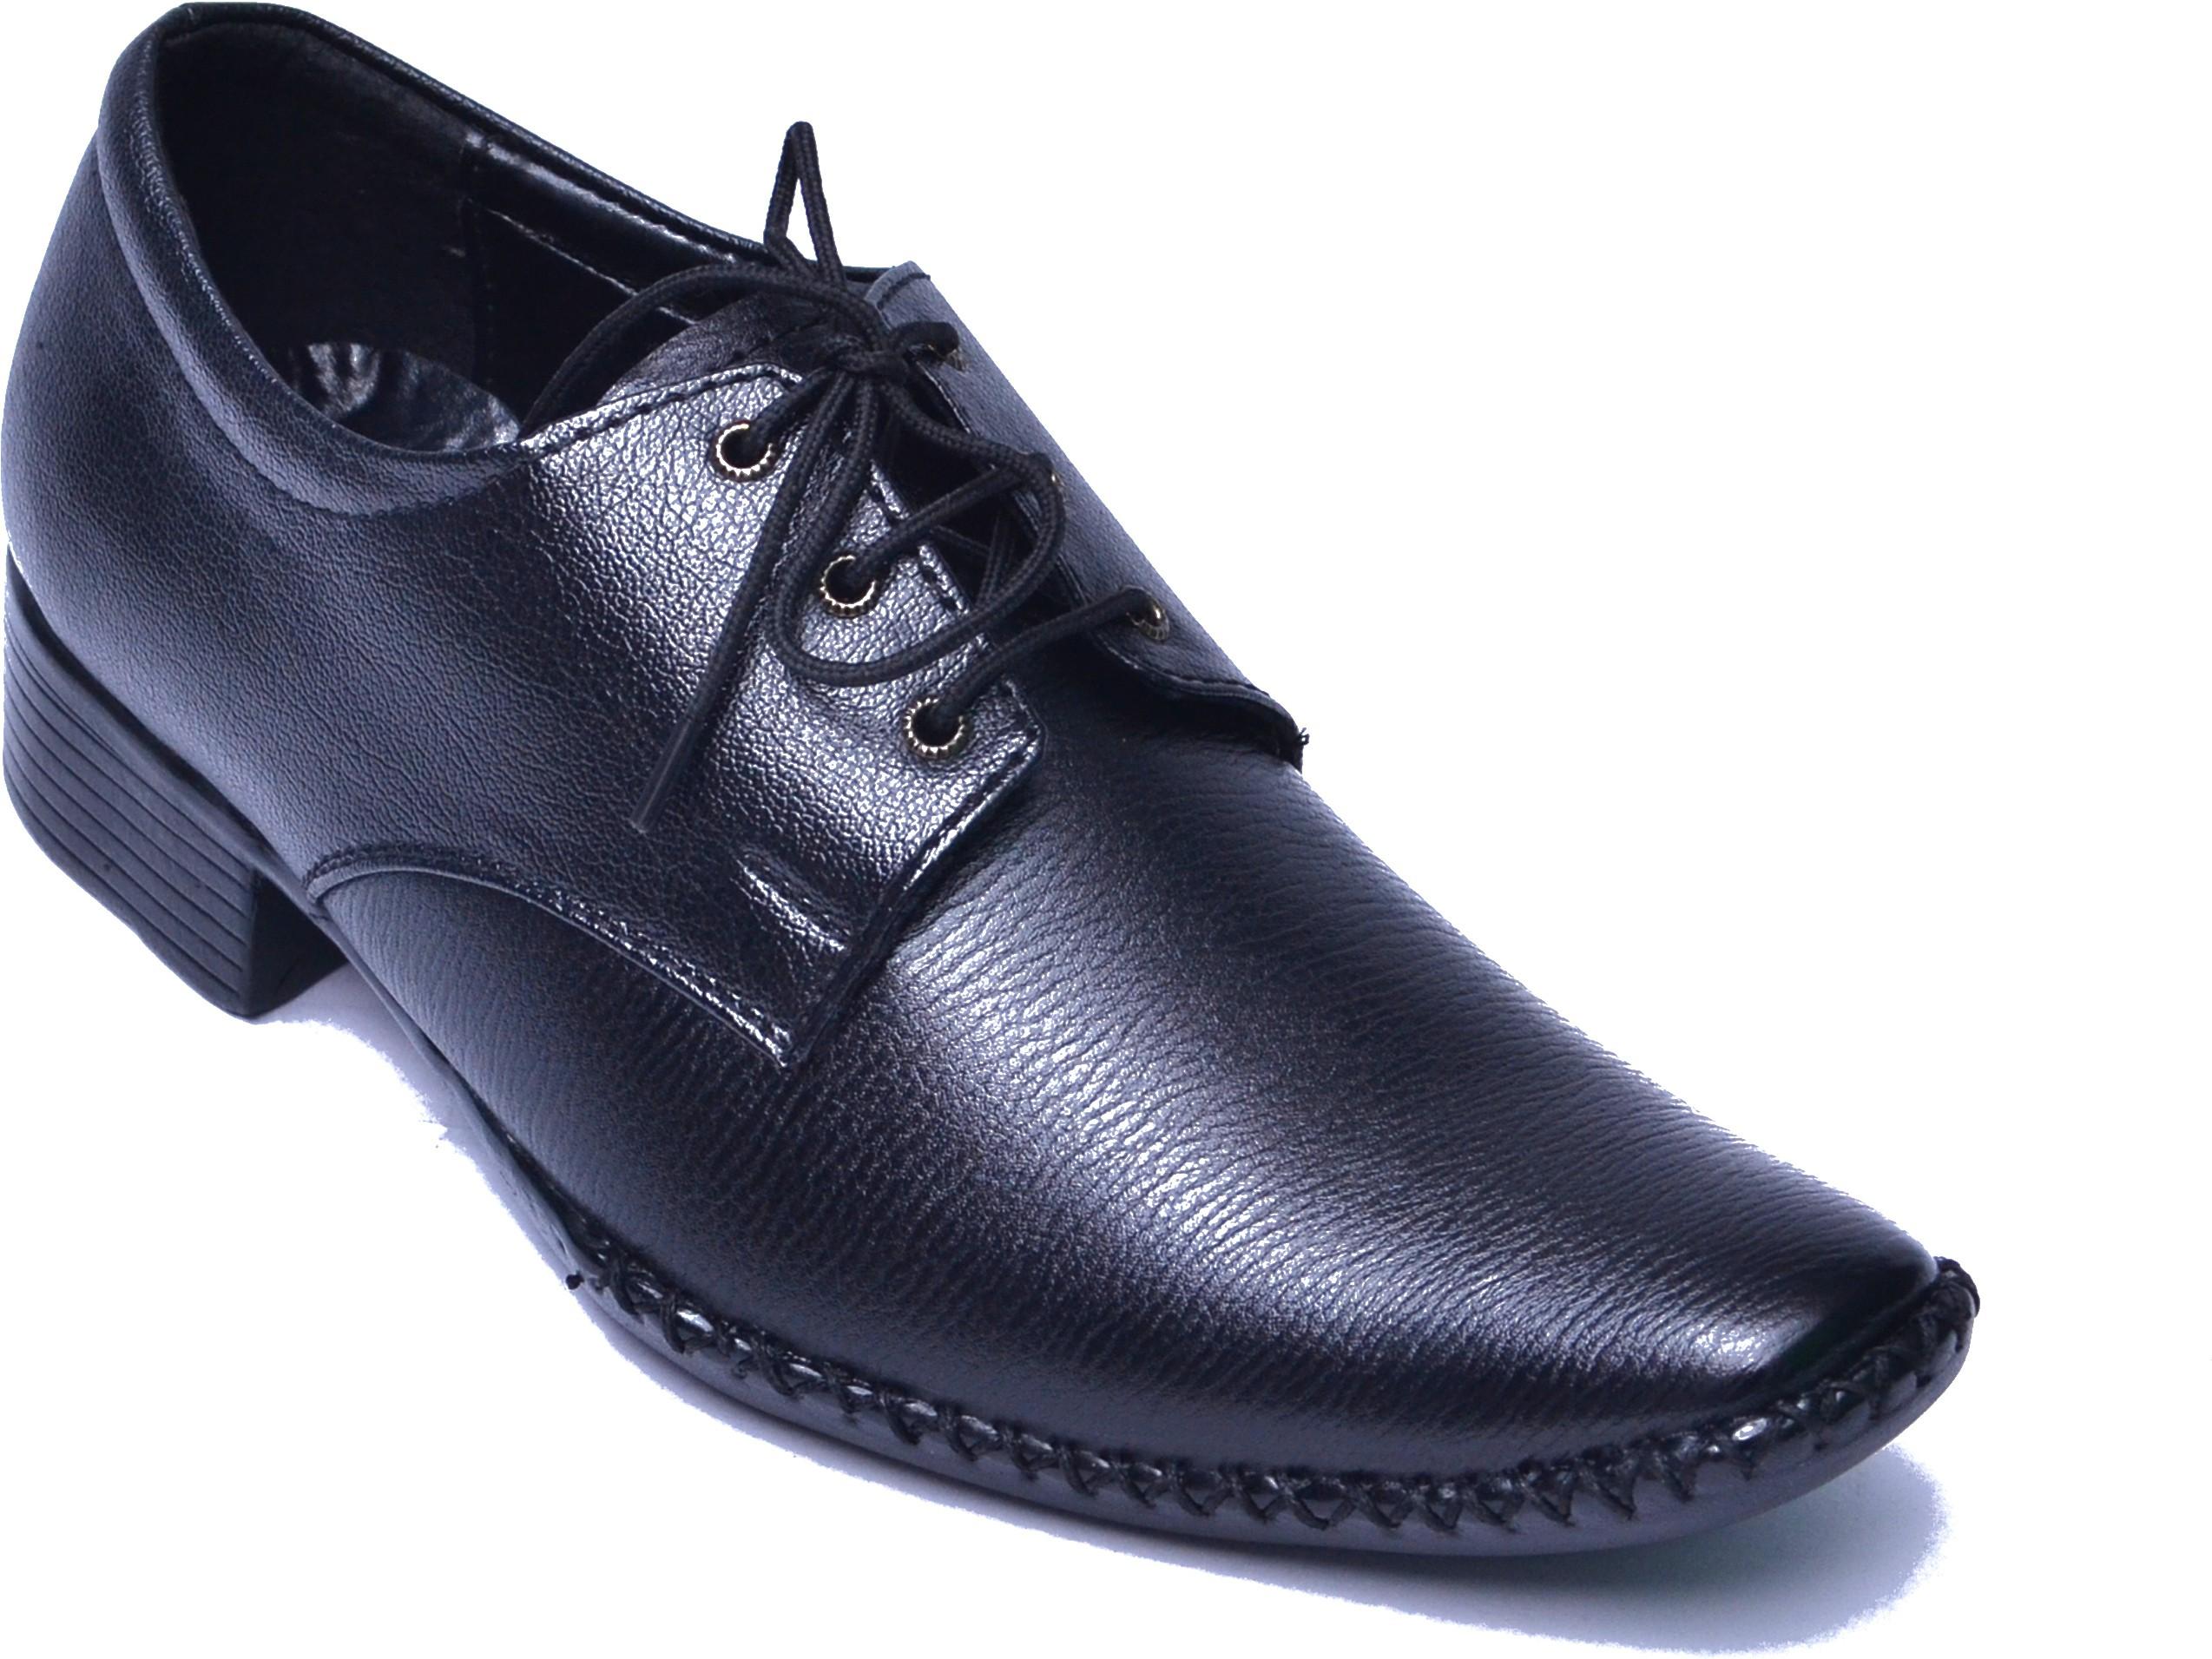 aadolf footwear gt gt formal shoes buy black color aadolf